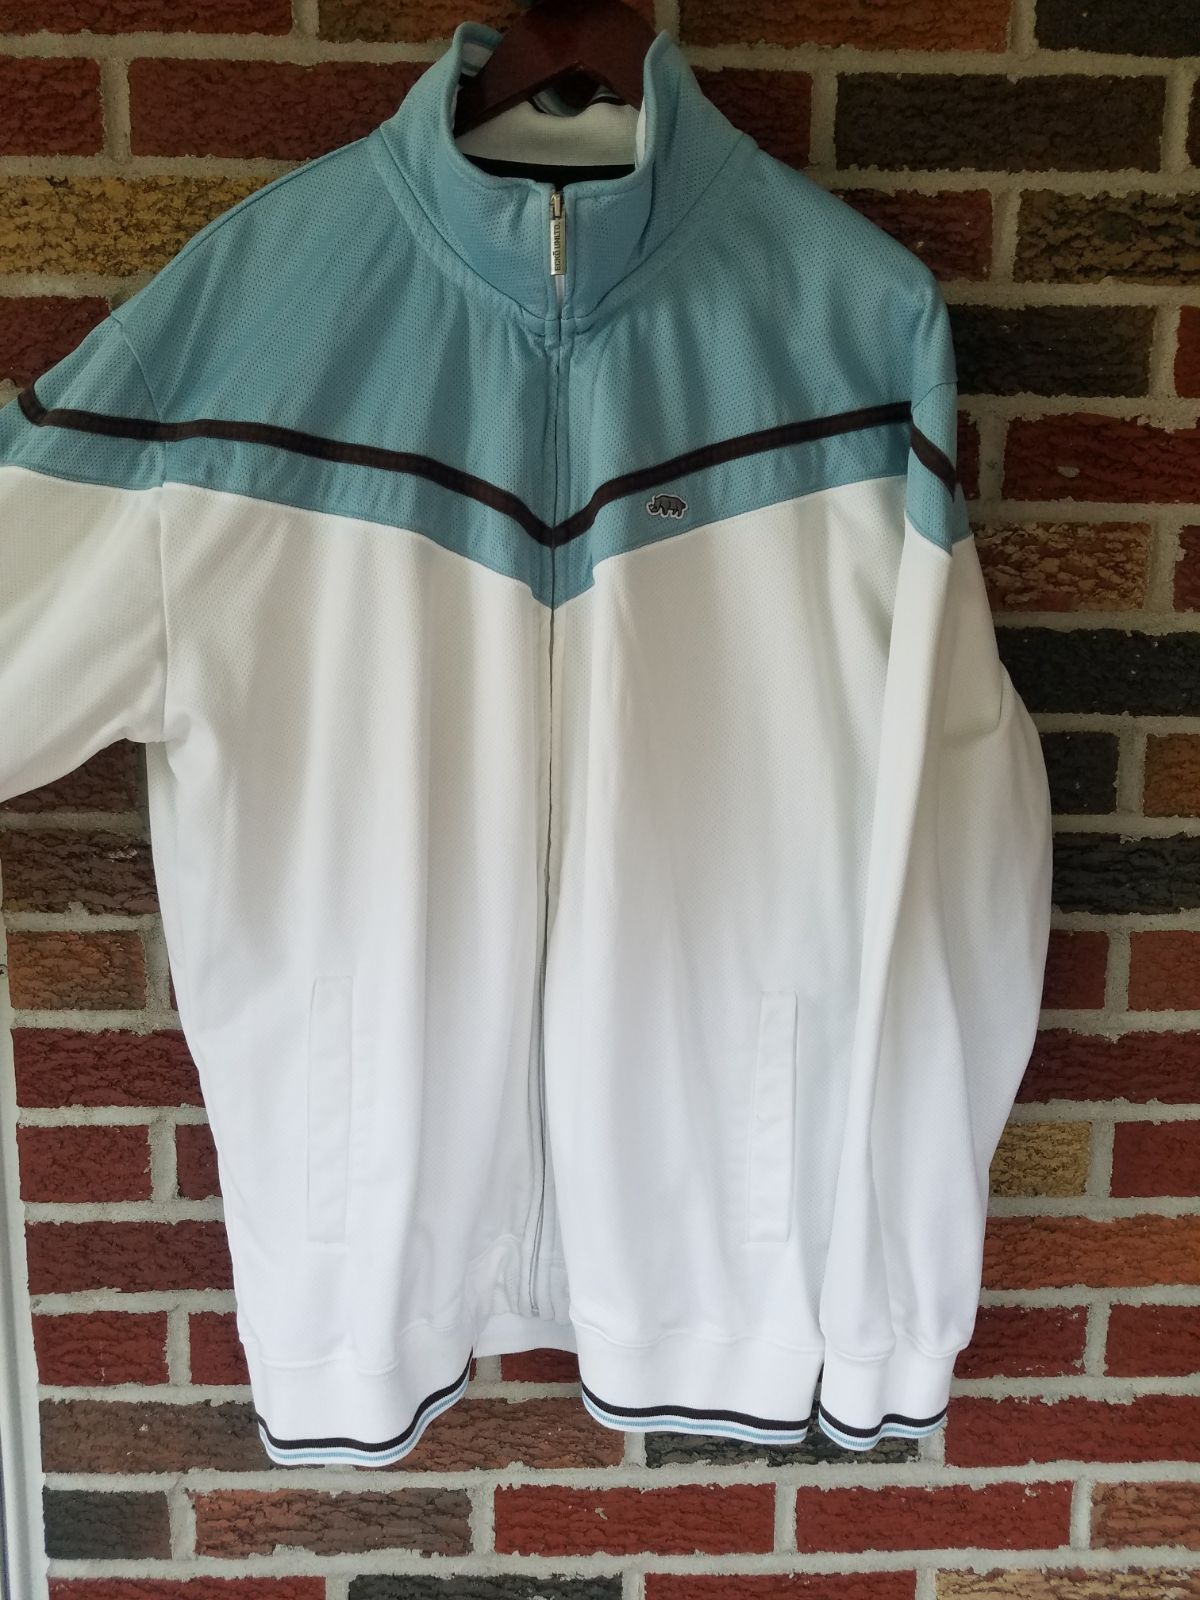 Ecko Unltd Mens Zip Up Jacket White Blue